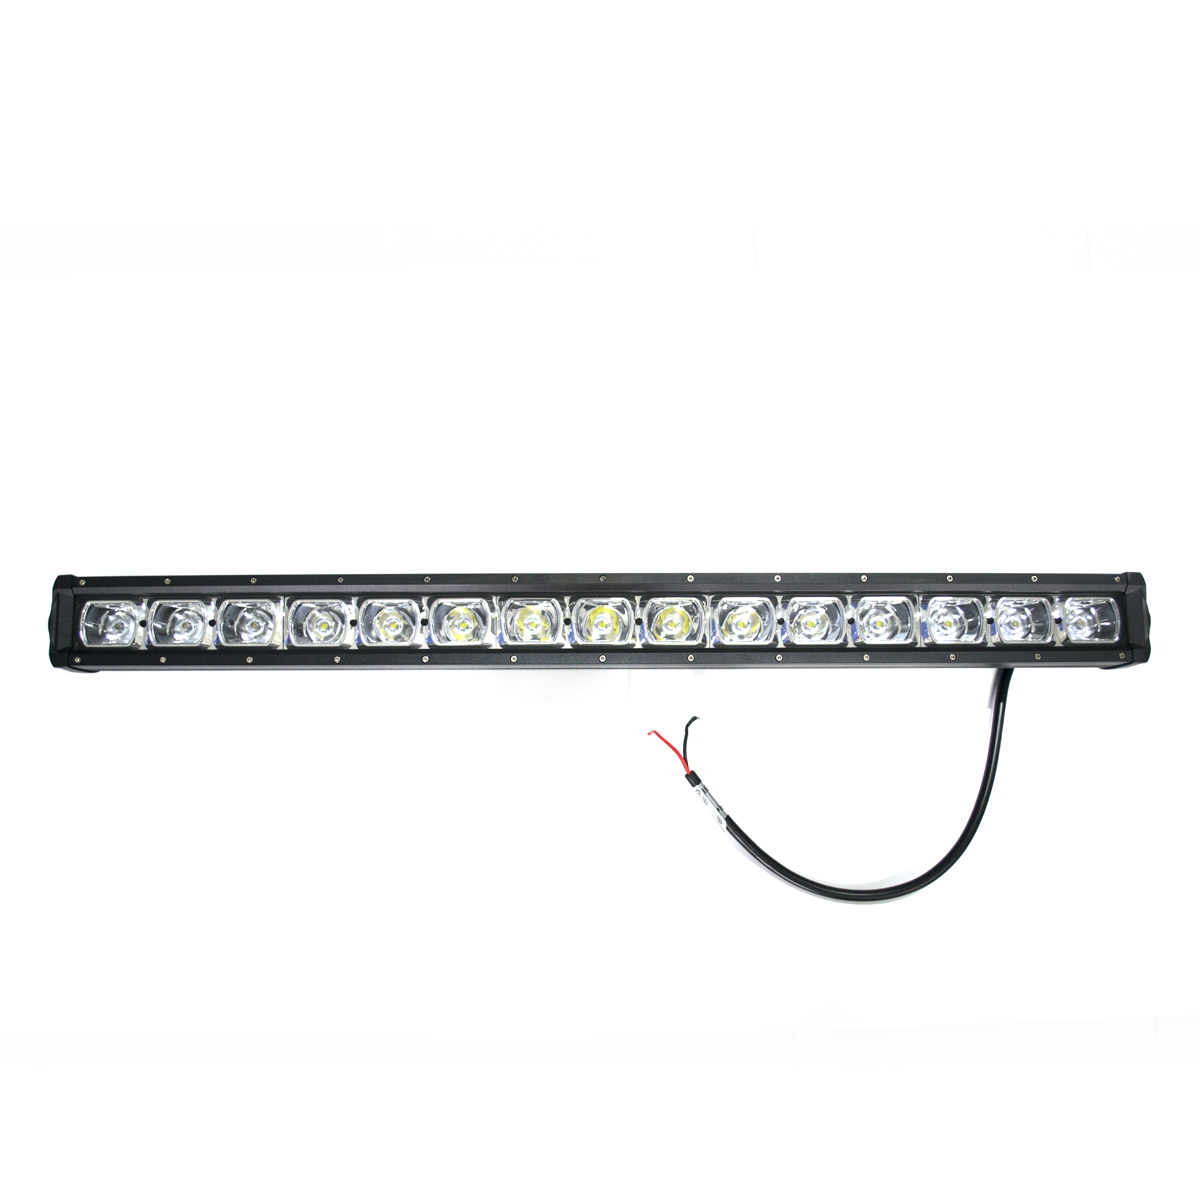 LED BAR CREE 850mm 150W 14700 Lm 10W F-97150 Square